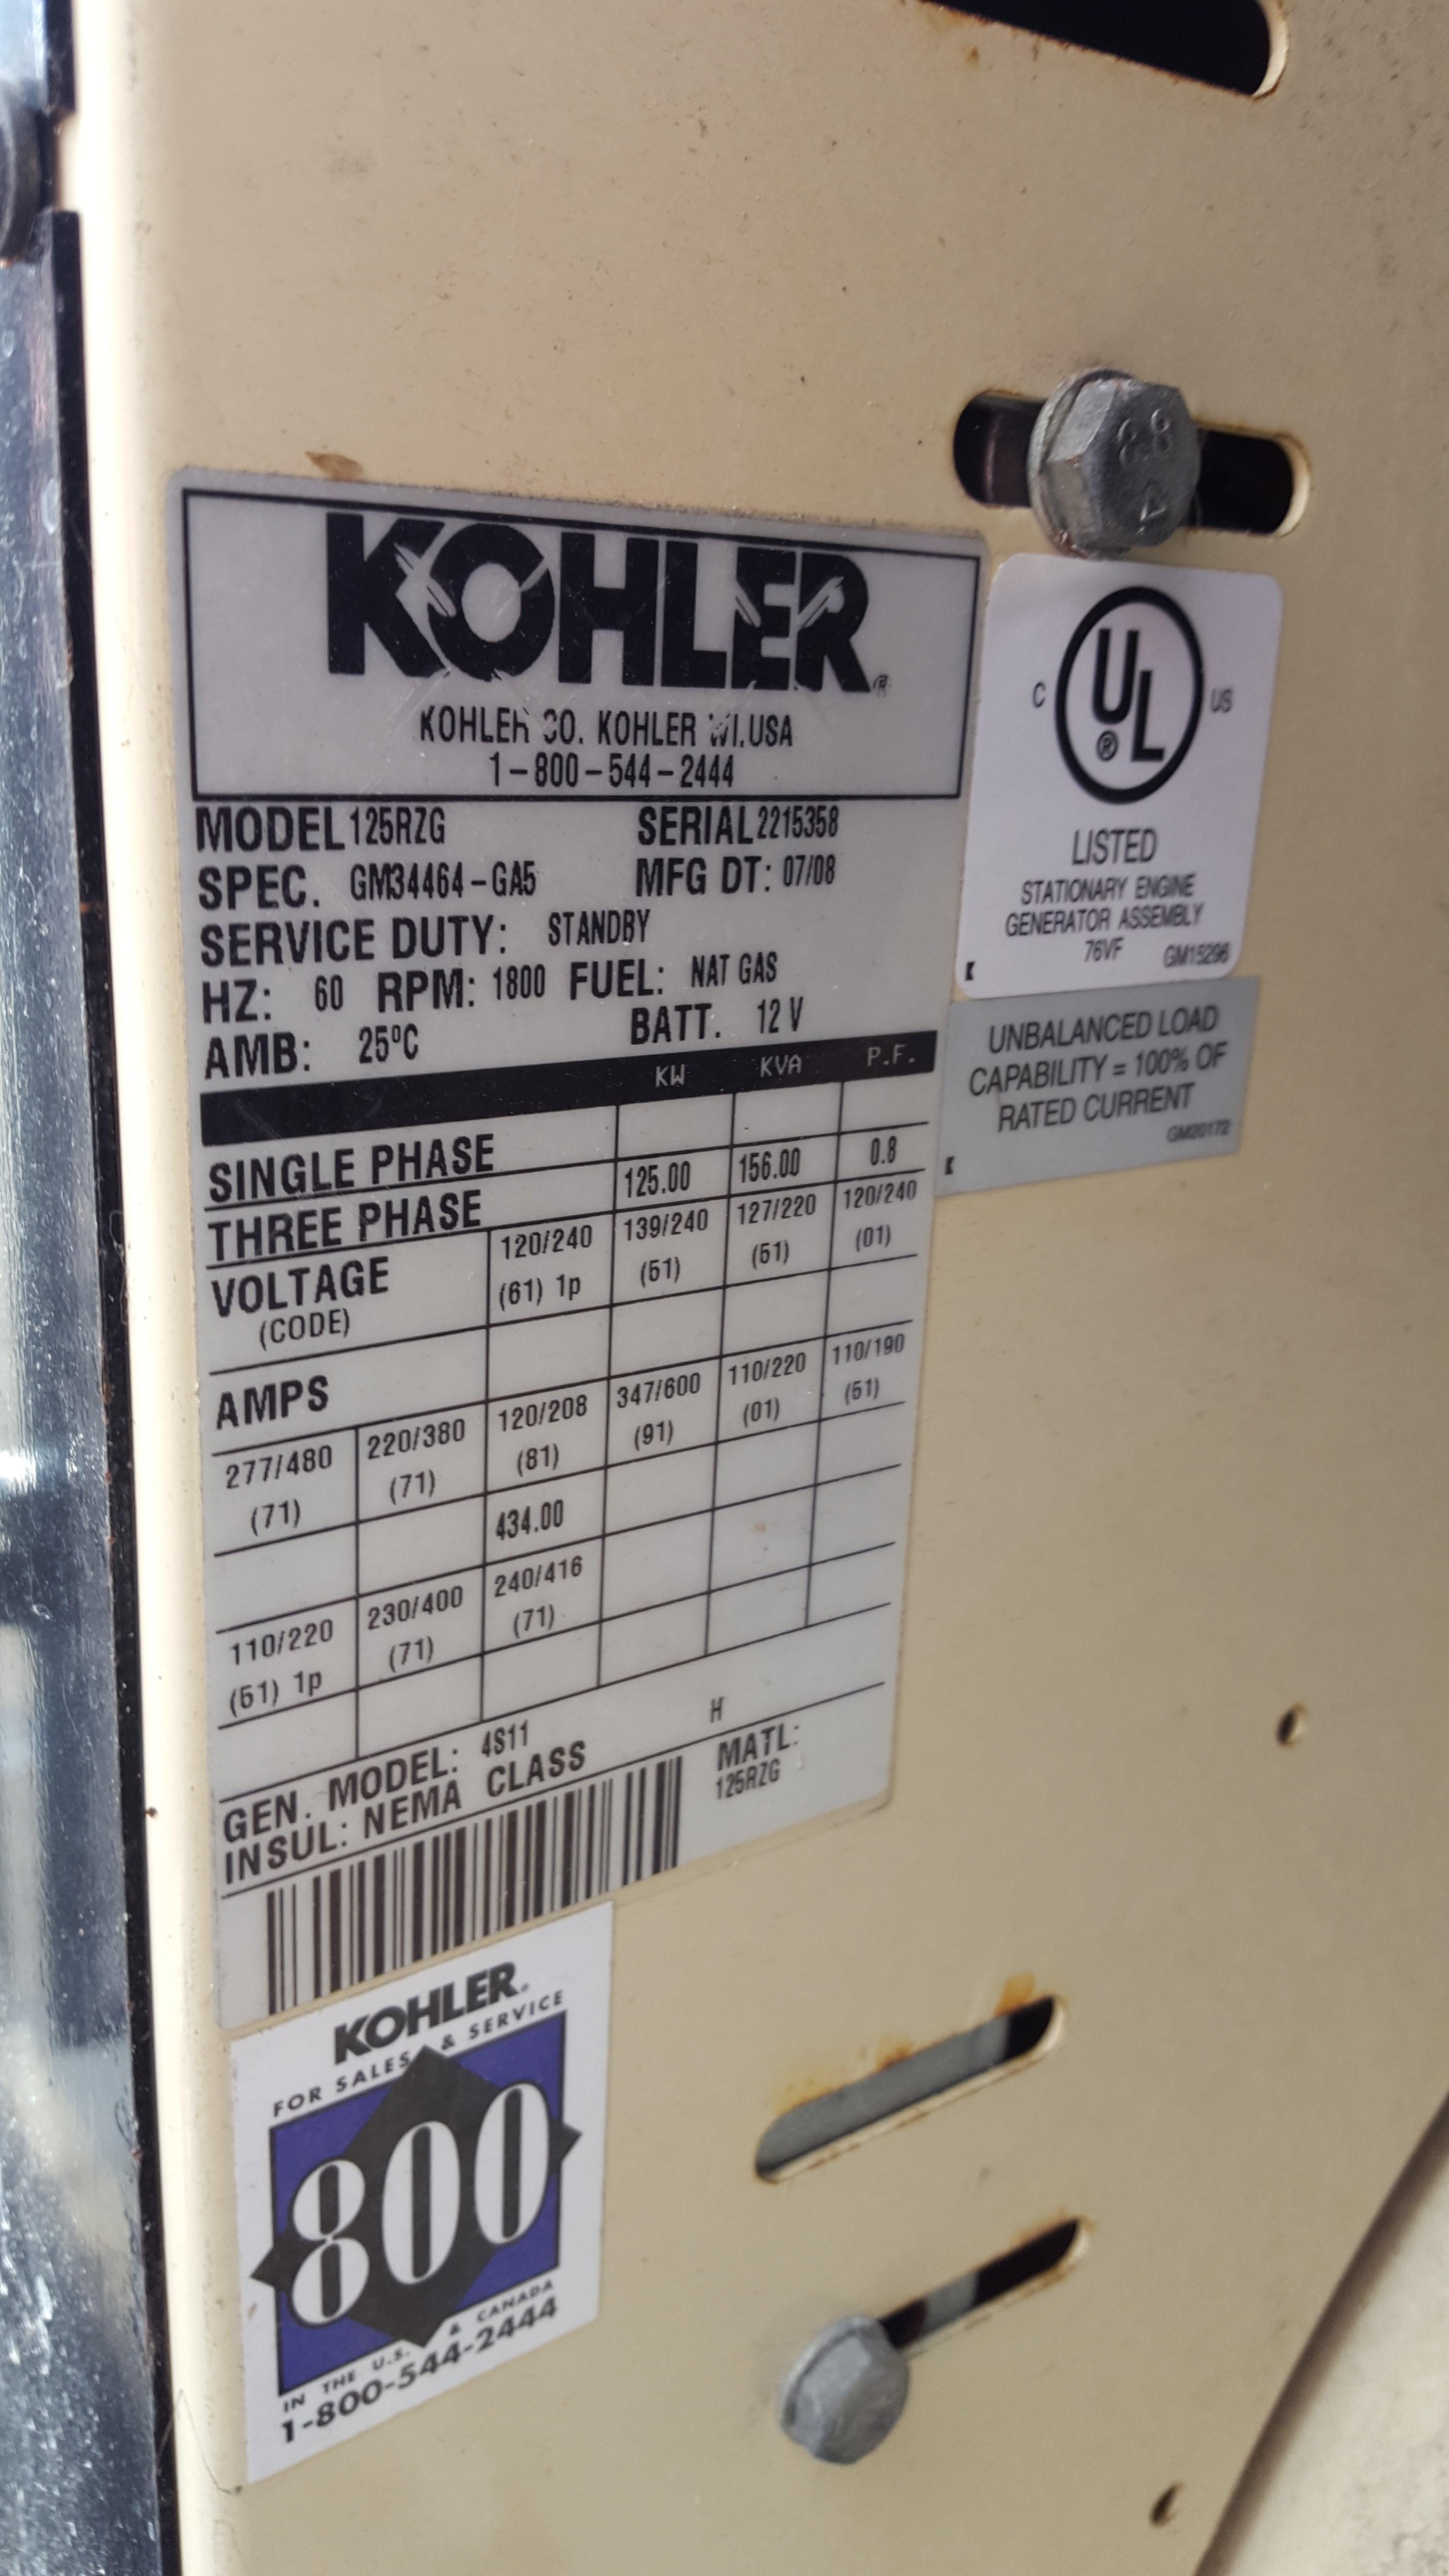 Kohler 125RZG 125 KW Diesel Engine & Generator | 13021 | New